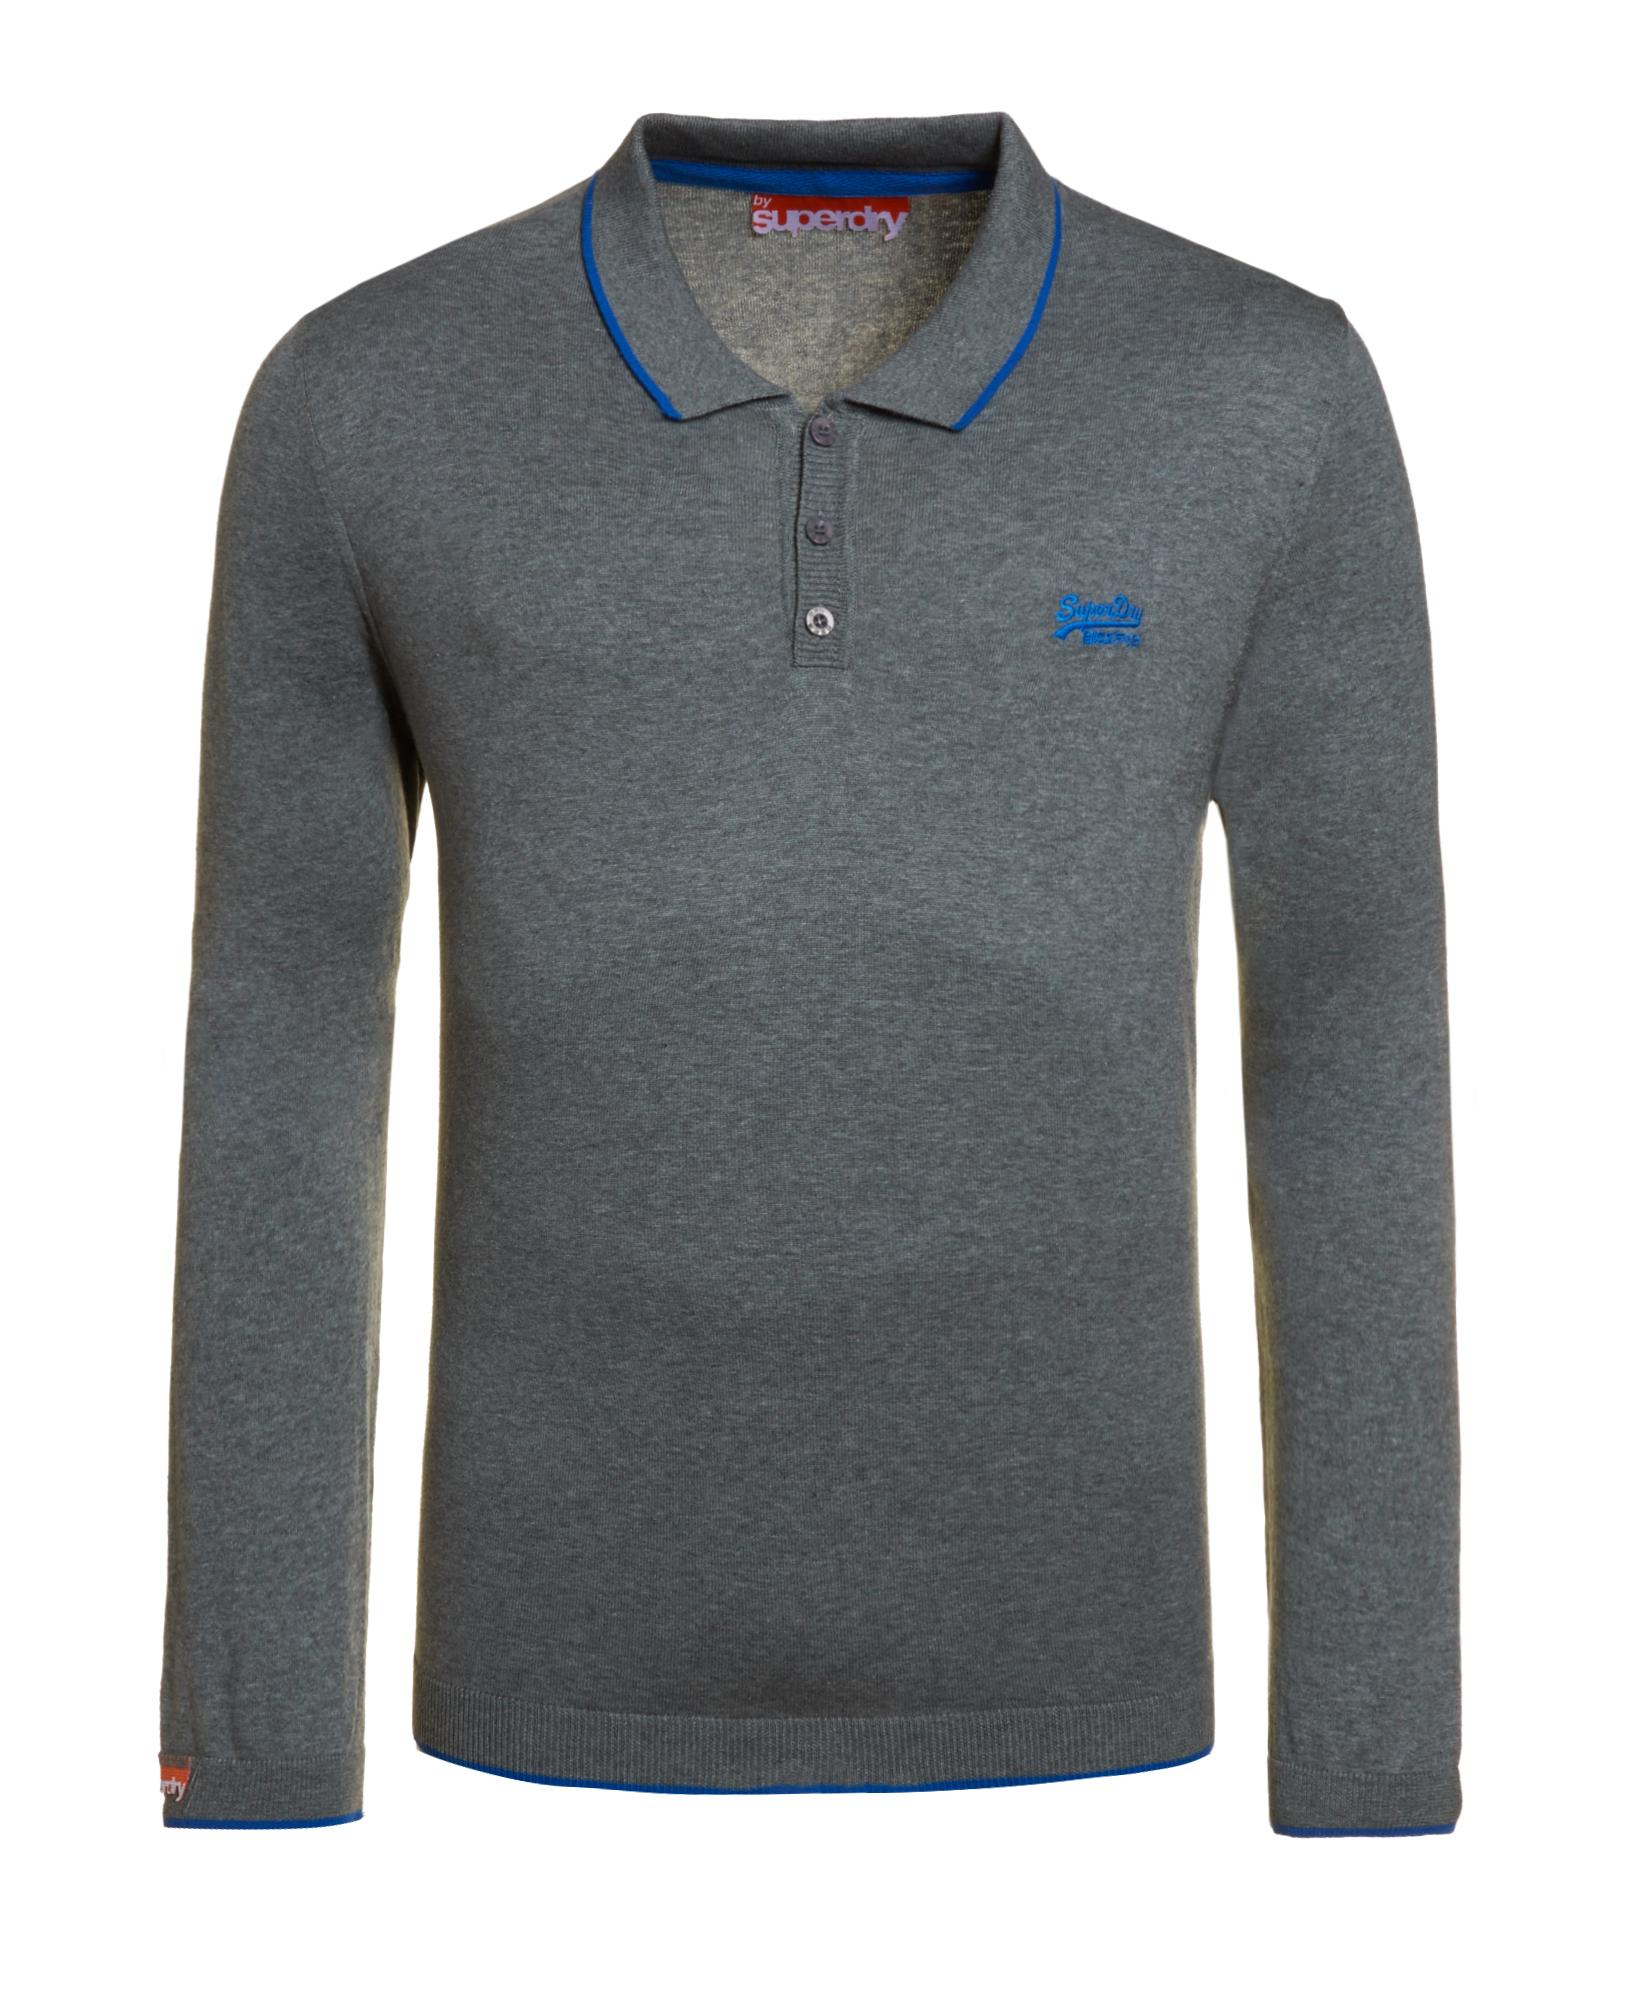 neues herren superdry knit polo shirt dark marl grau ebay. Black Bedroom Furniture Sets. Home Design Ideas